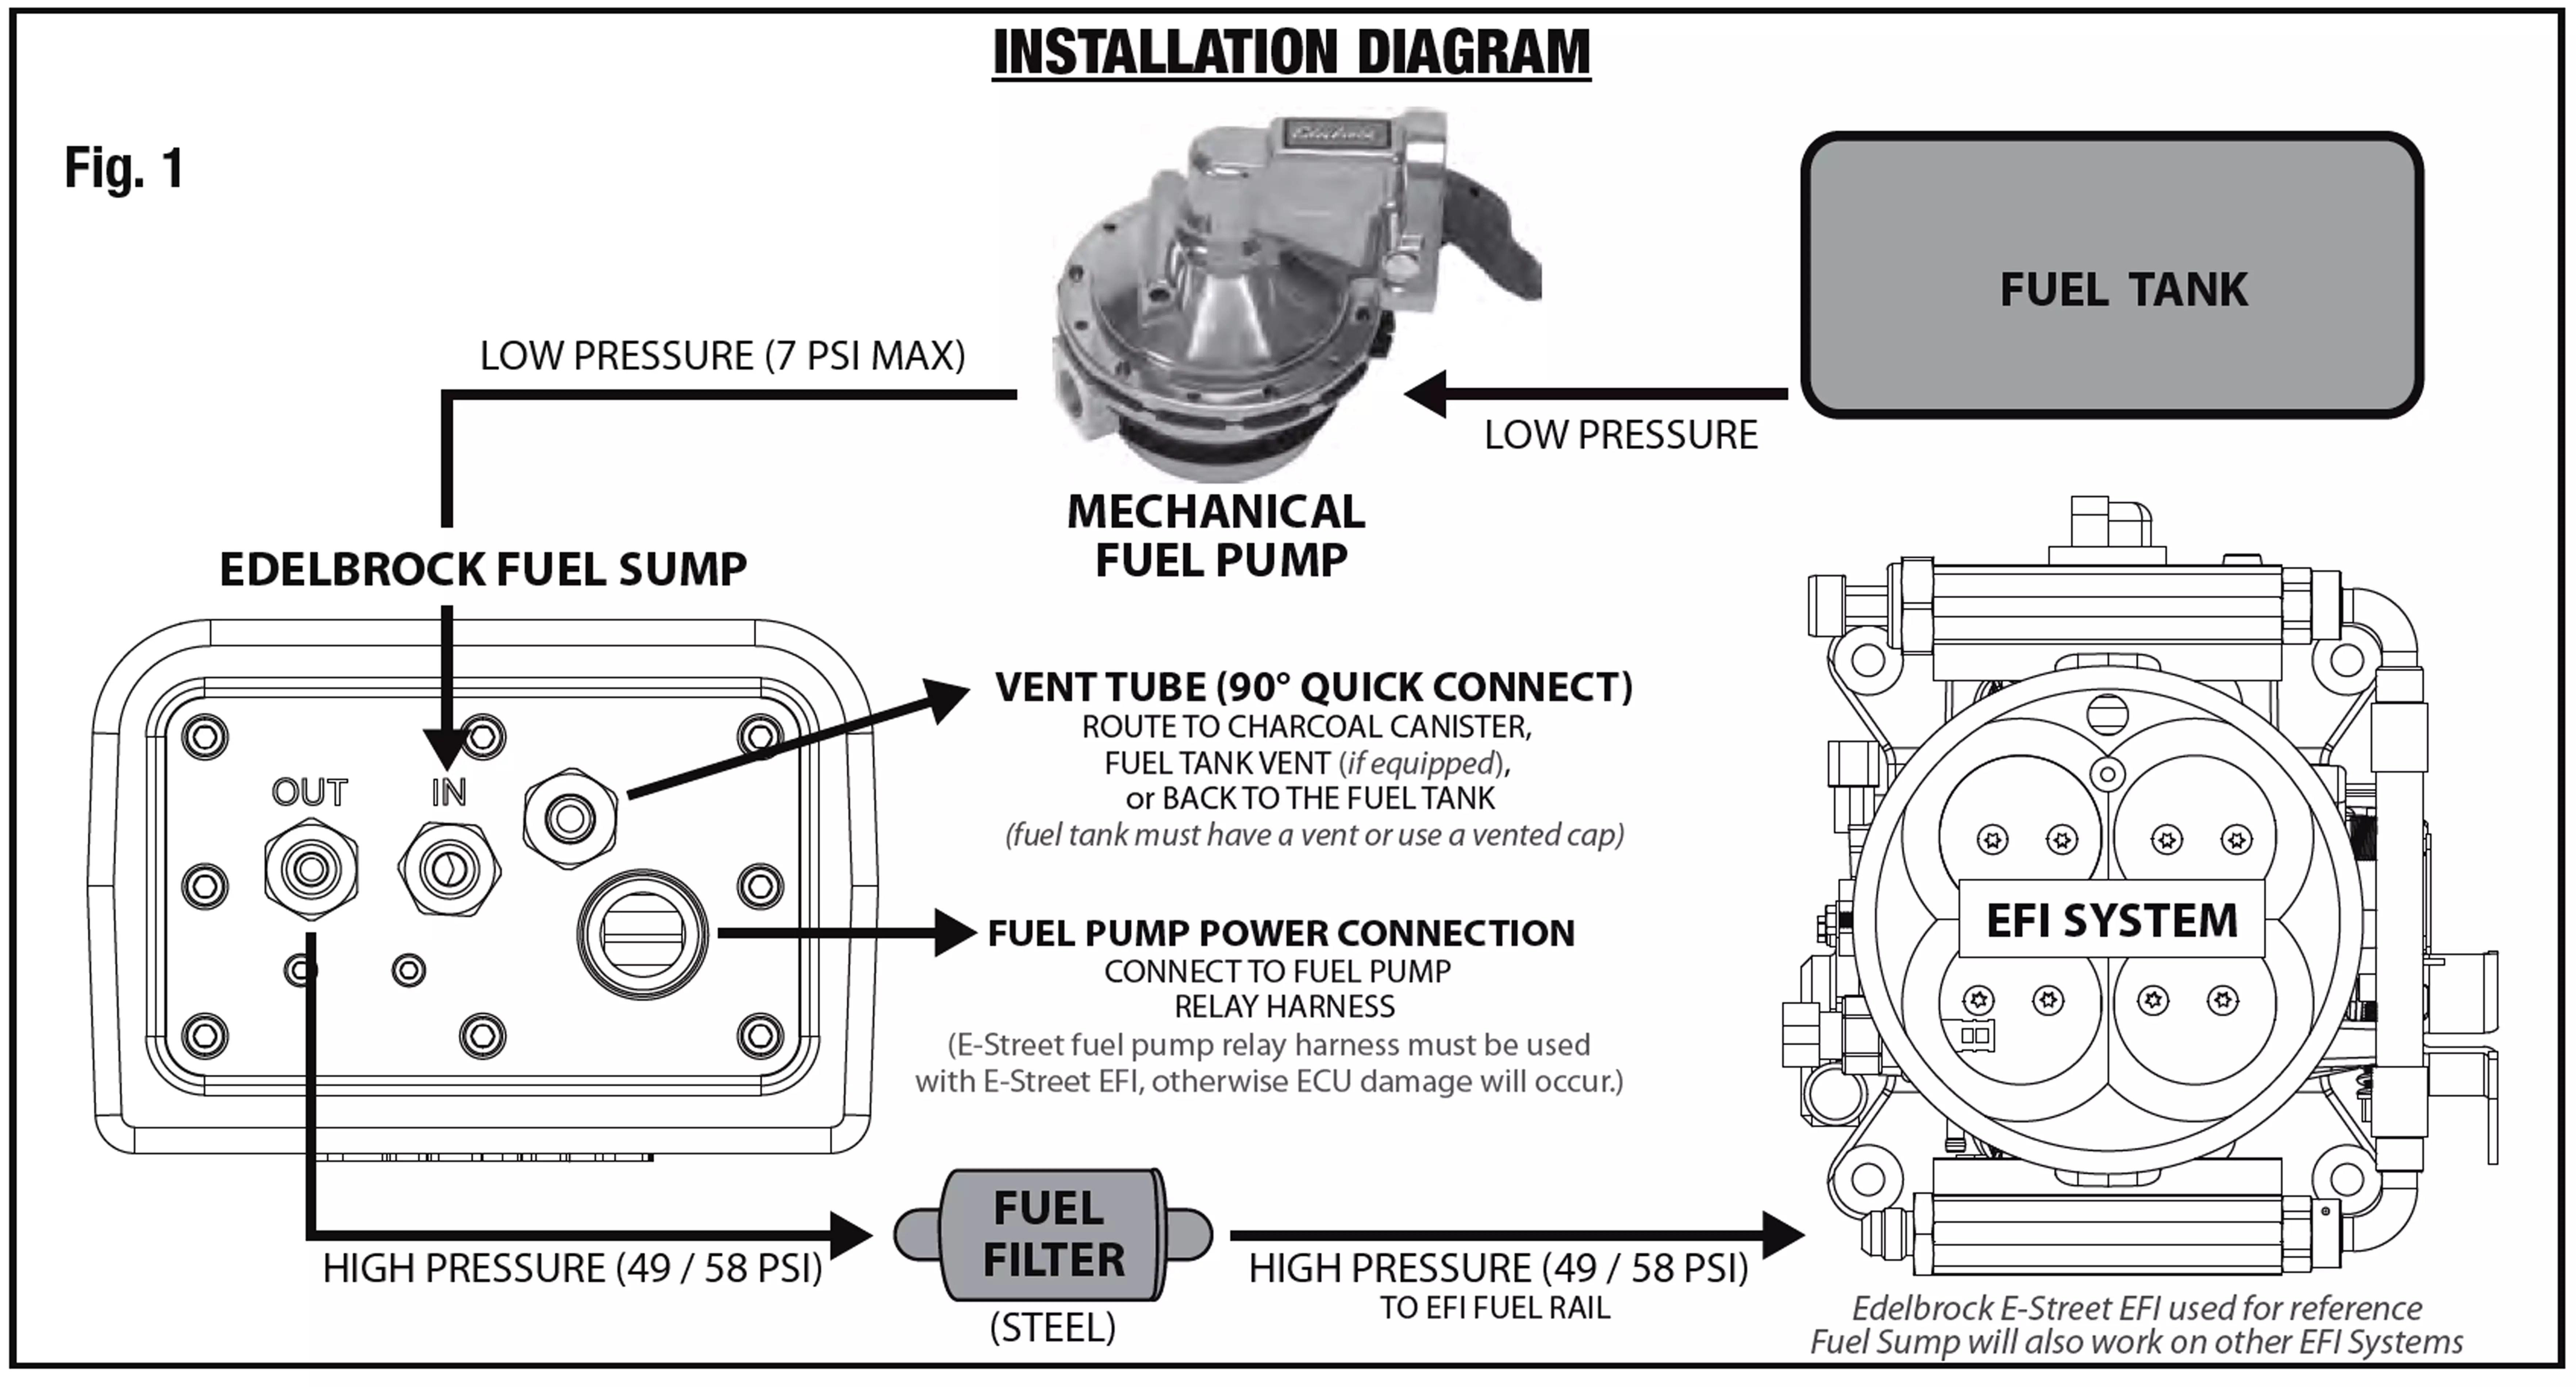 electric fuel pump relay wiring diagram Wiring Diagram For Fuel Pump Relay electric fuel pump wiring diagram wiring diagram for fuel pump relay